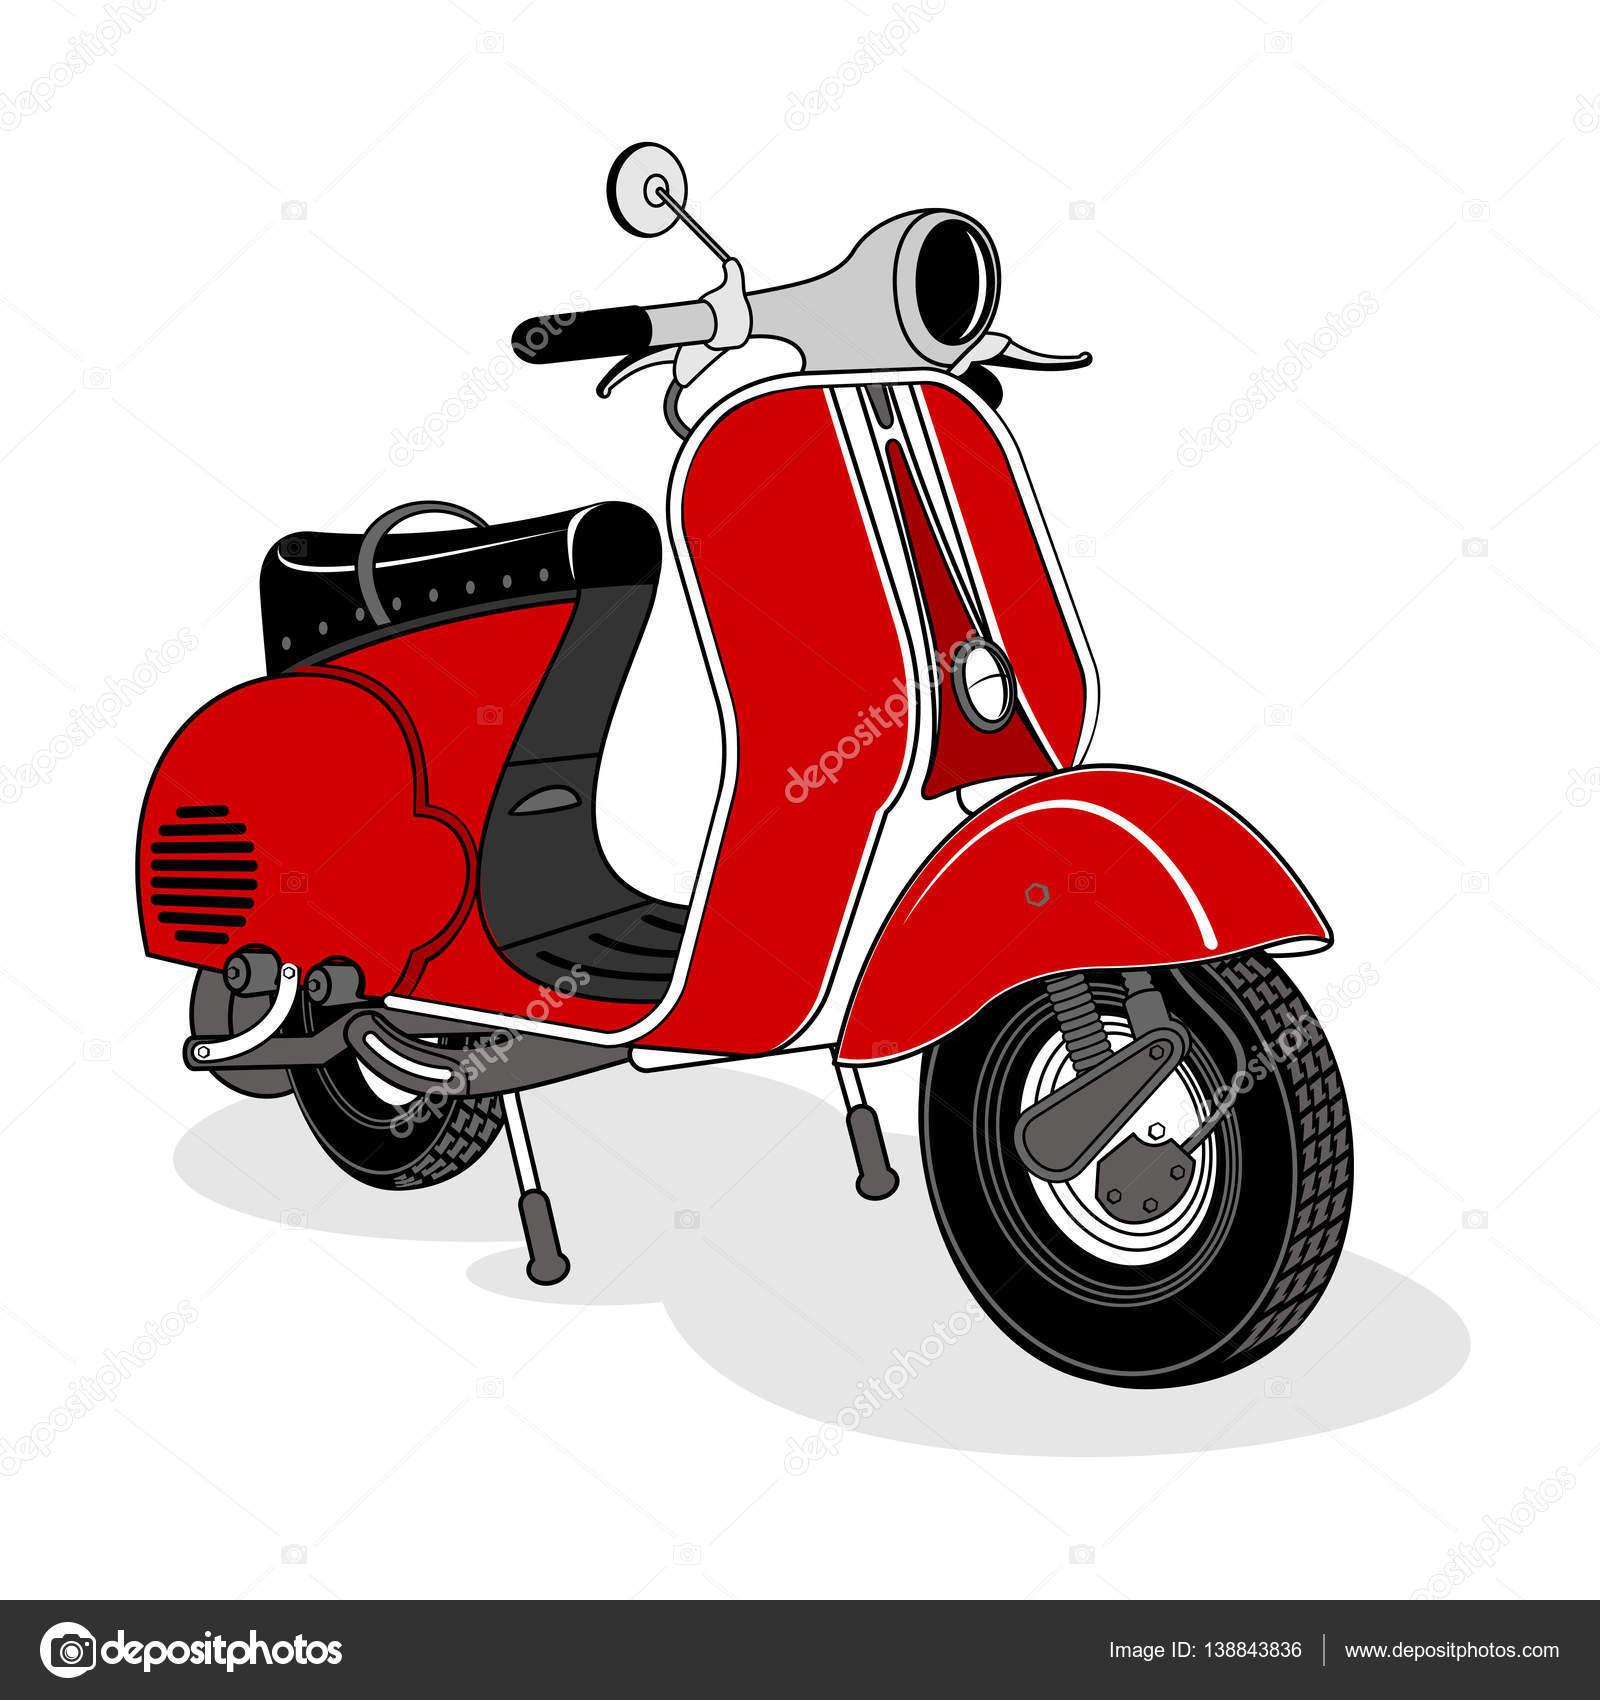 ᐈ Racing Vespa Stock Vectors Royalty Free Vespa Illustrations Illustrations Download On Depositphotos